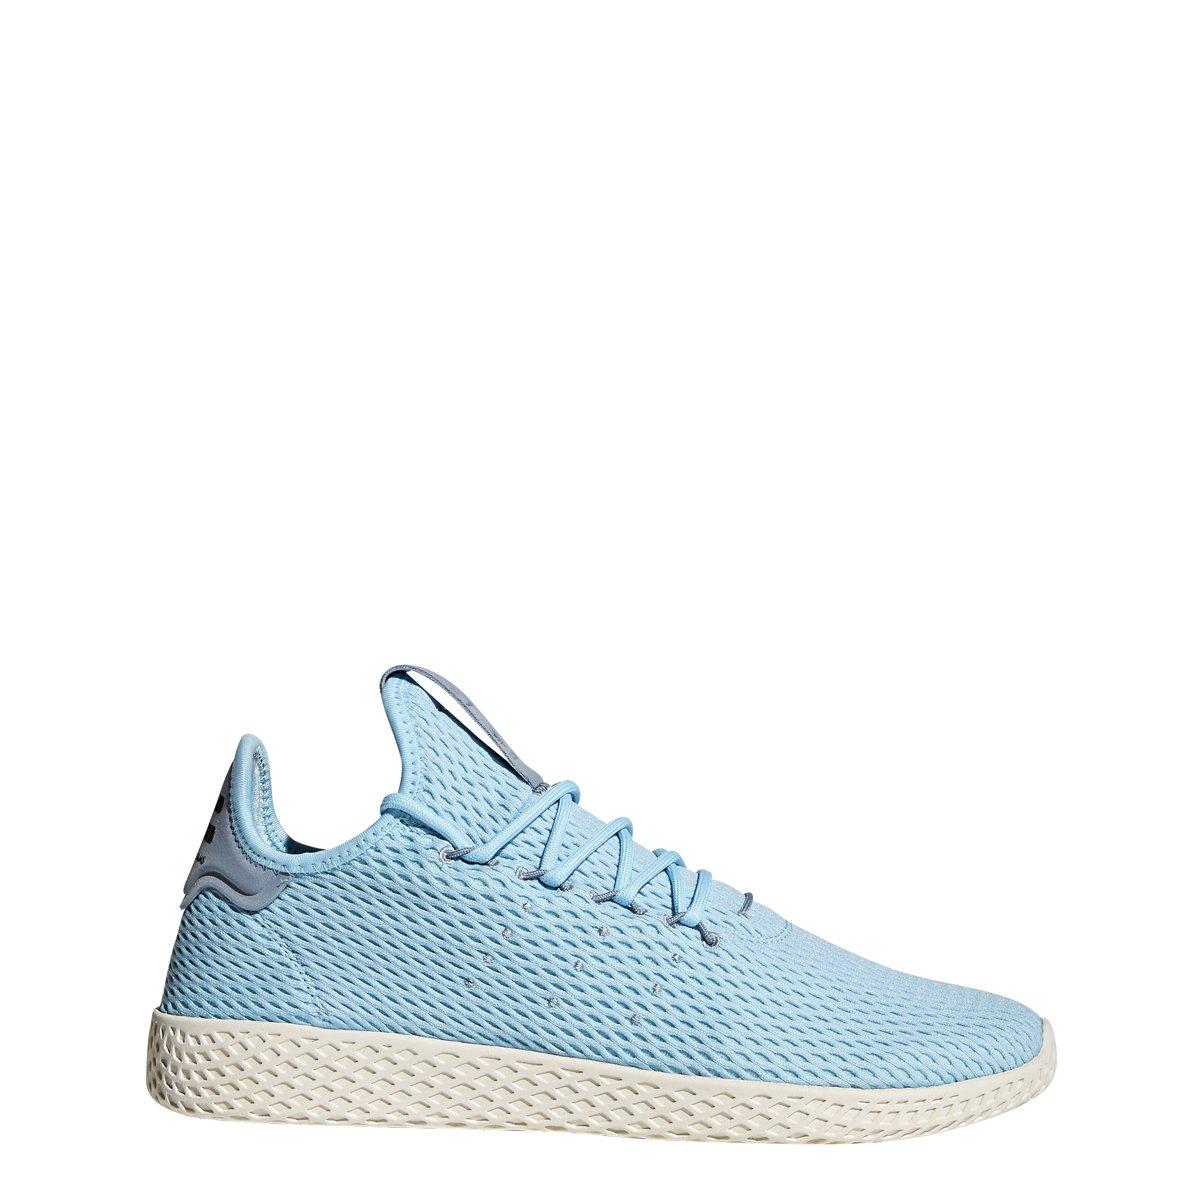 adidas Men's Pw Tennis Hu Sneaker B075ZZGVQ4 5.5 D(M) US|Ice Blue/Ice Blue/Blue